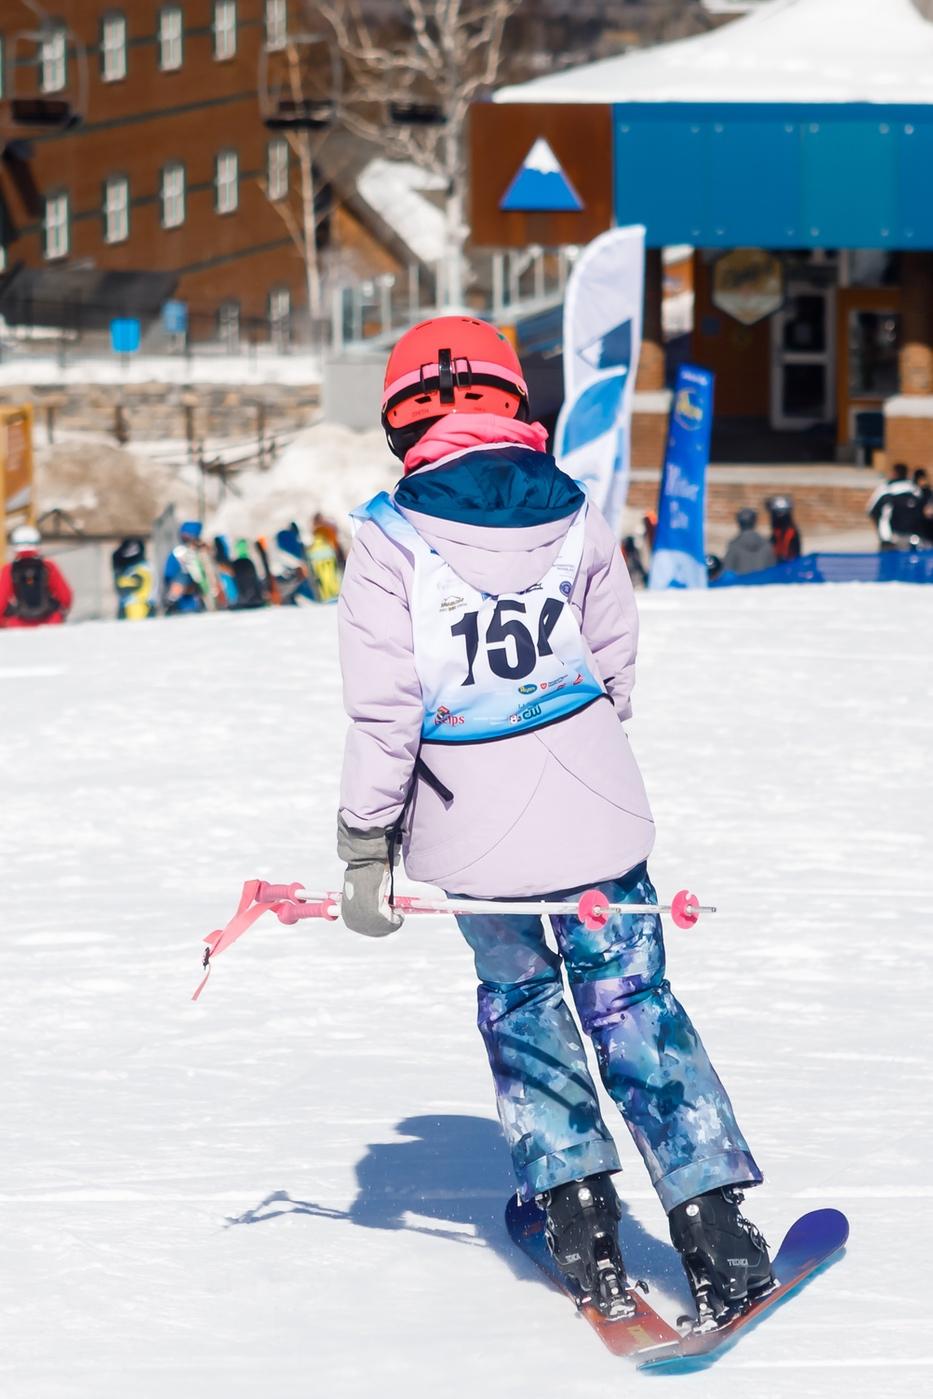 WinterKids Downhill 24 2021 SDP 3056